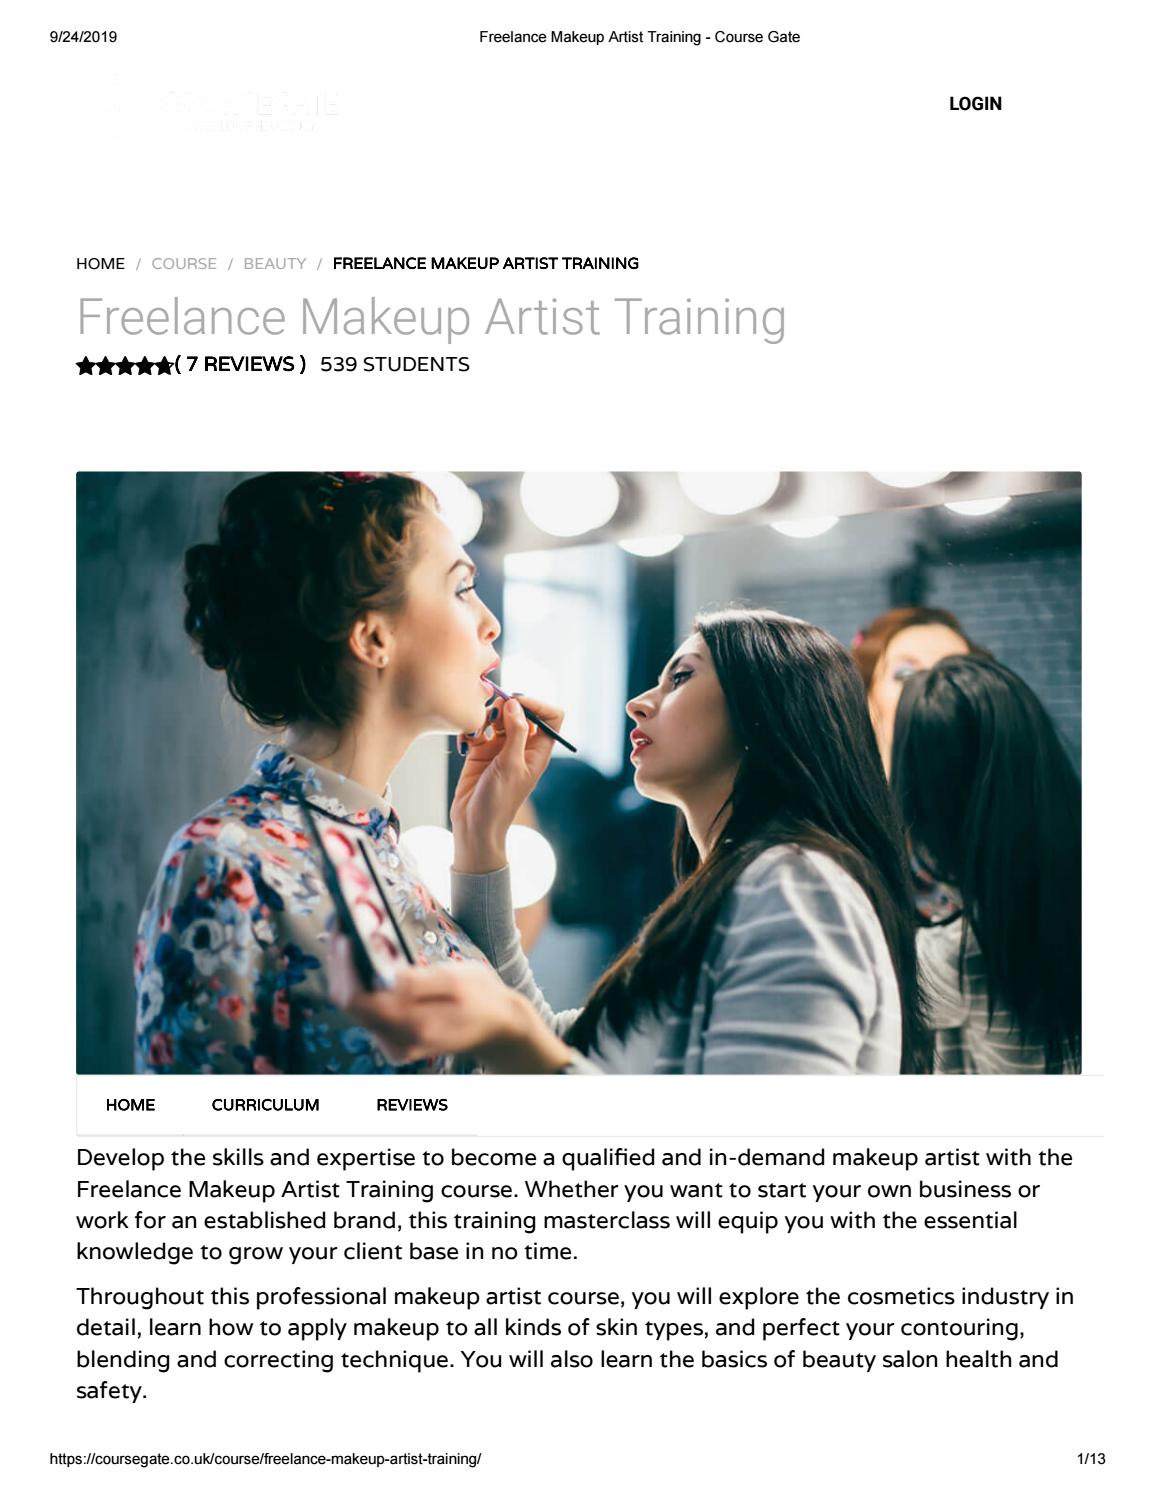 Freelance Makeup Artist Training